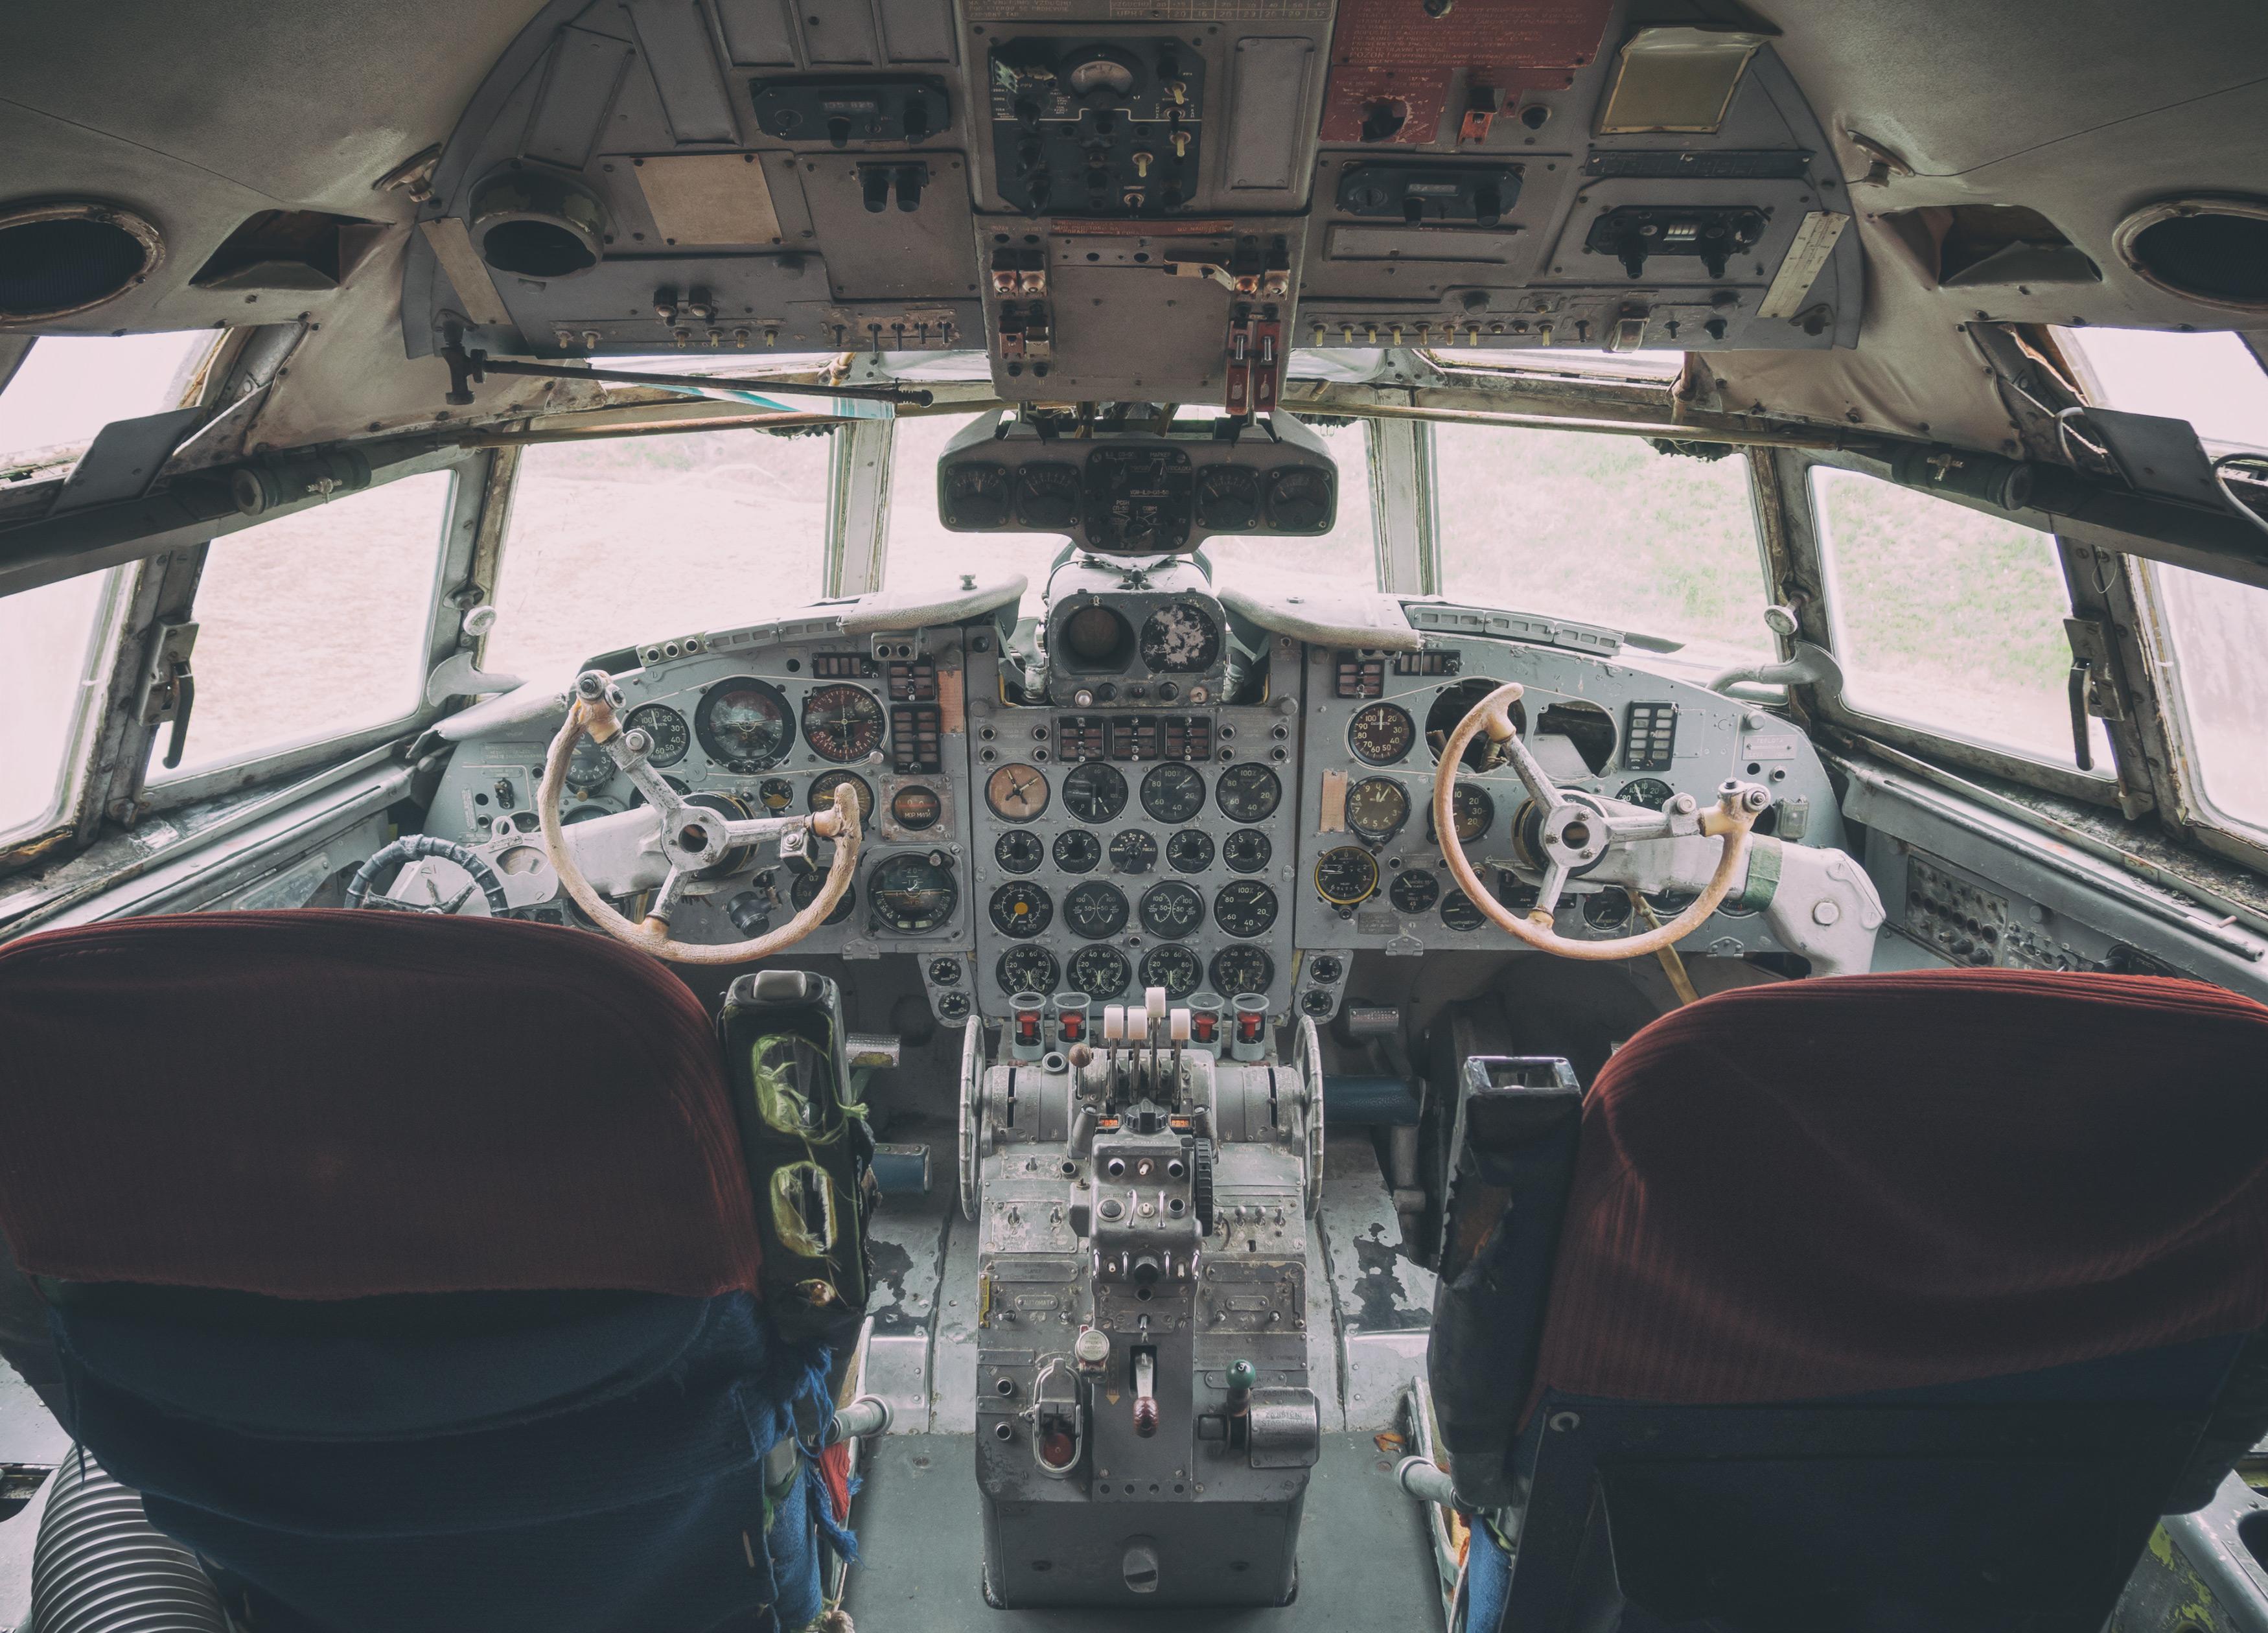 Aircraft Cockpit | FREE image on LibreShot